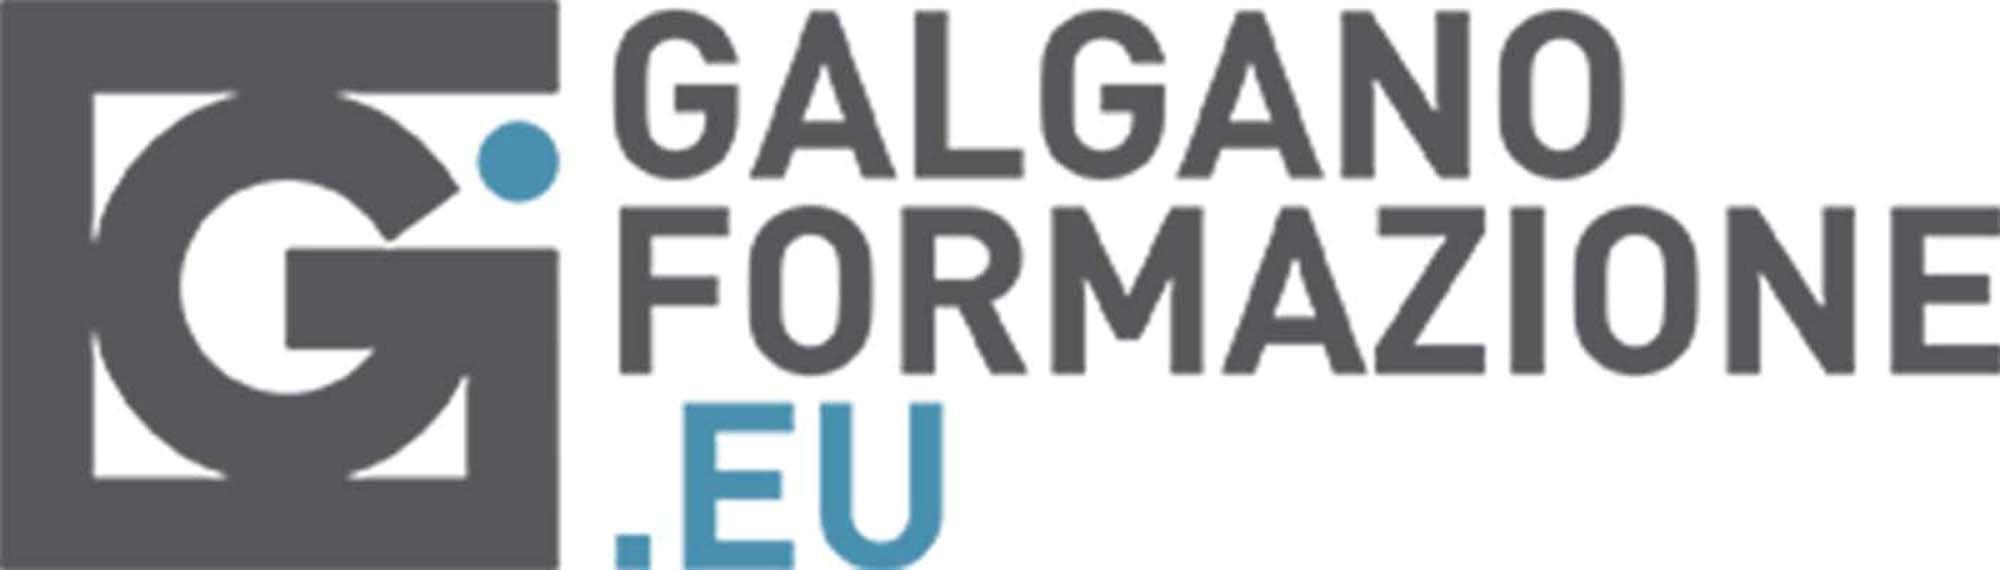 Galgano Informatica srl